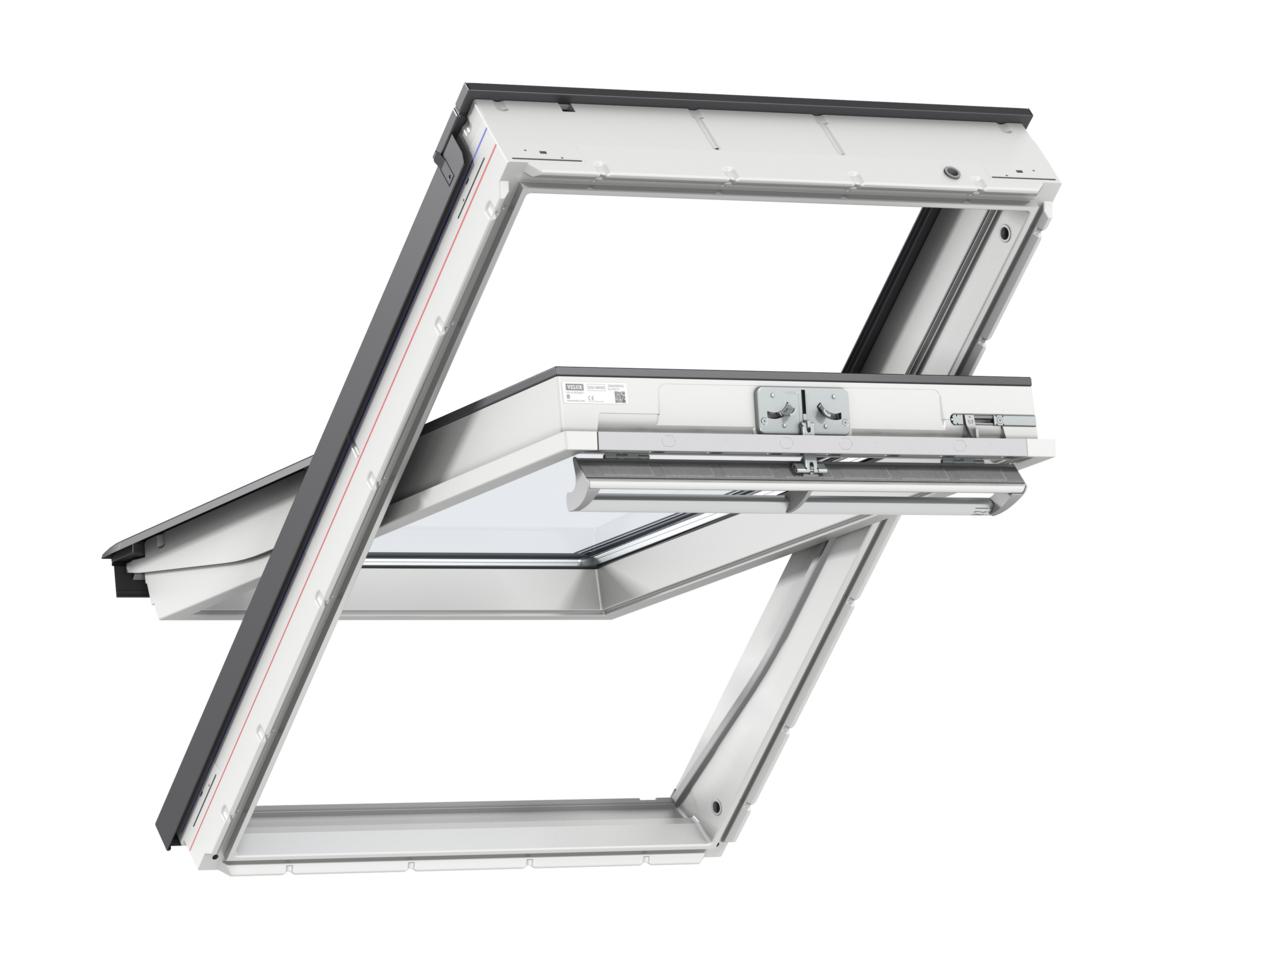 Velux GGU UK08 1340 x 1400mm Centre Pivot 34Pane Roof Window - White Polyurethane